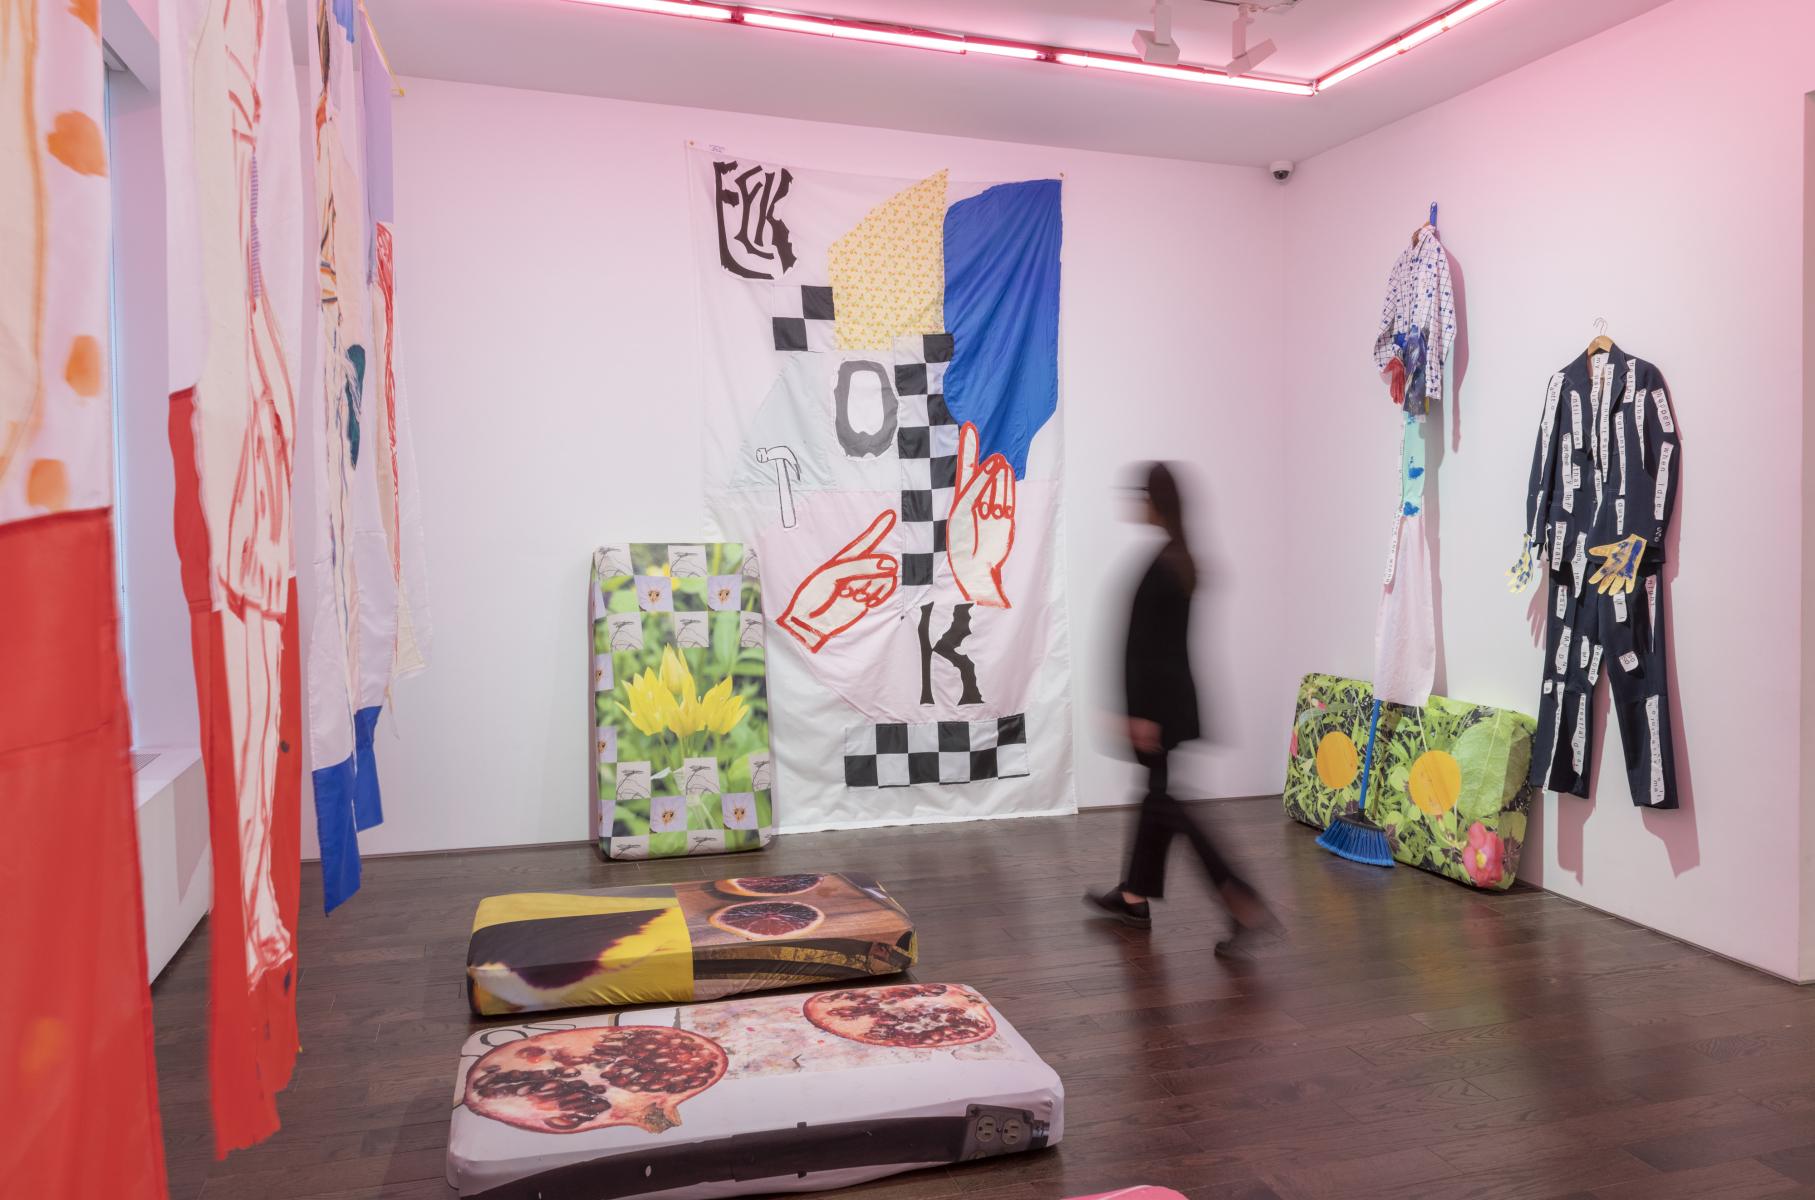 Exhibition View, Sadie Laska & Sara Magenheimer, LuLLabIES, 2021, Ceysson & Bénétière New York